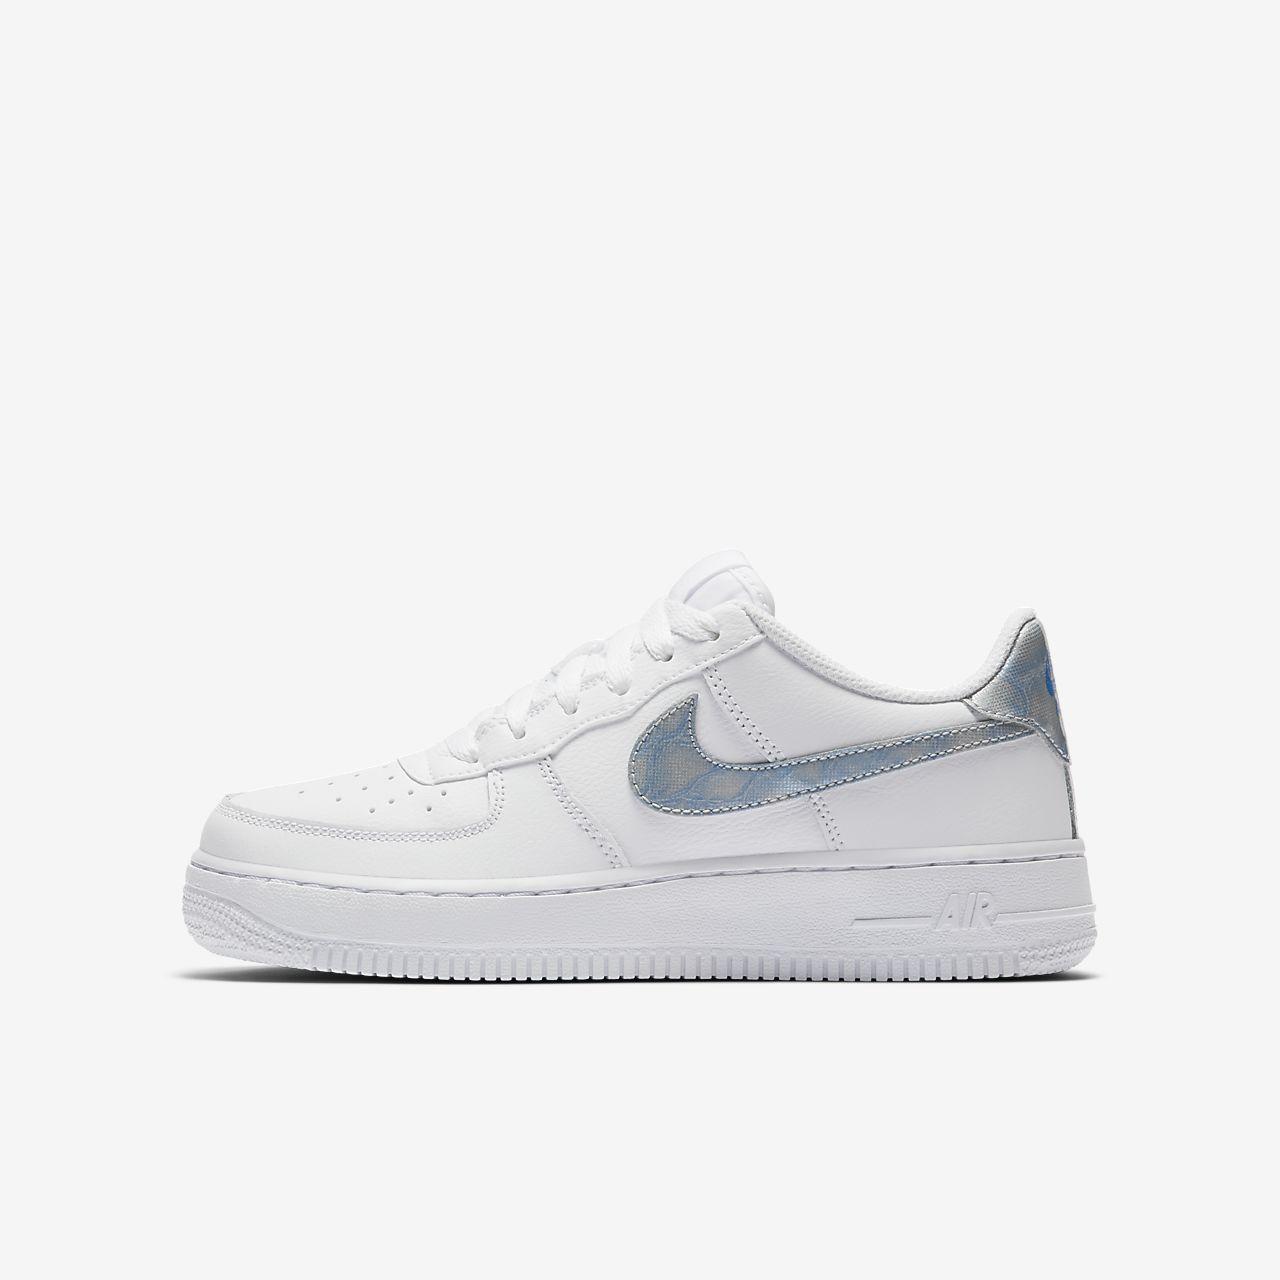 Calzado para niños talla grande Nike Air Force 1 ' MX